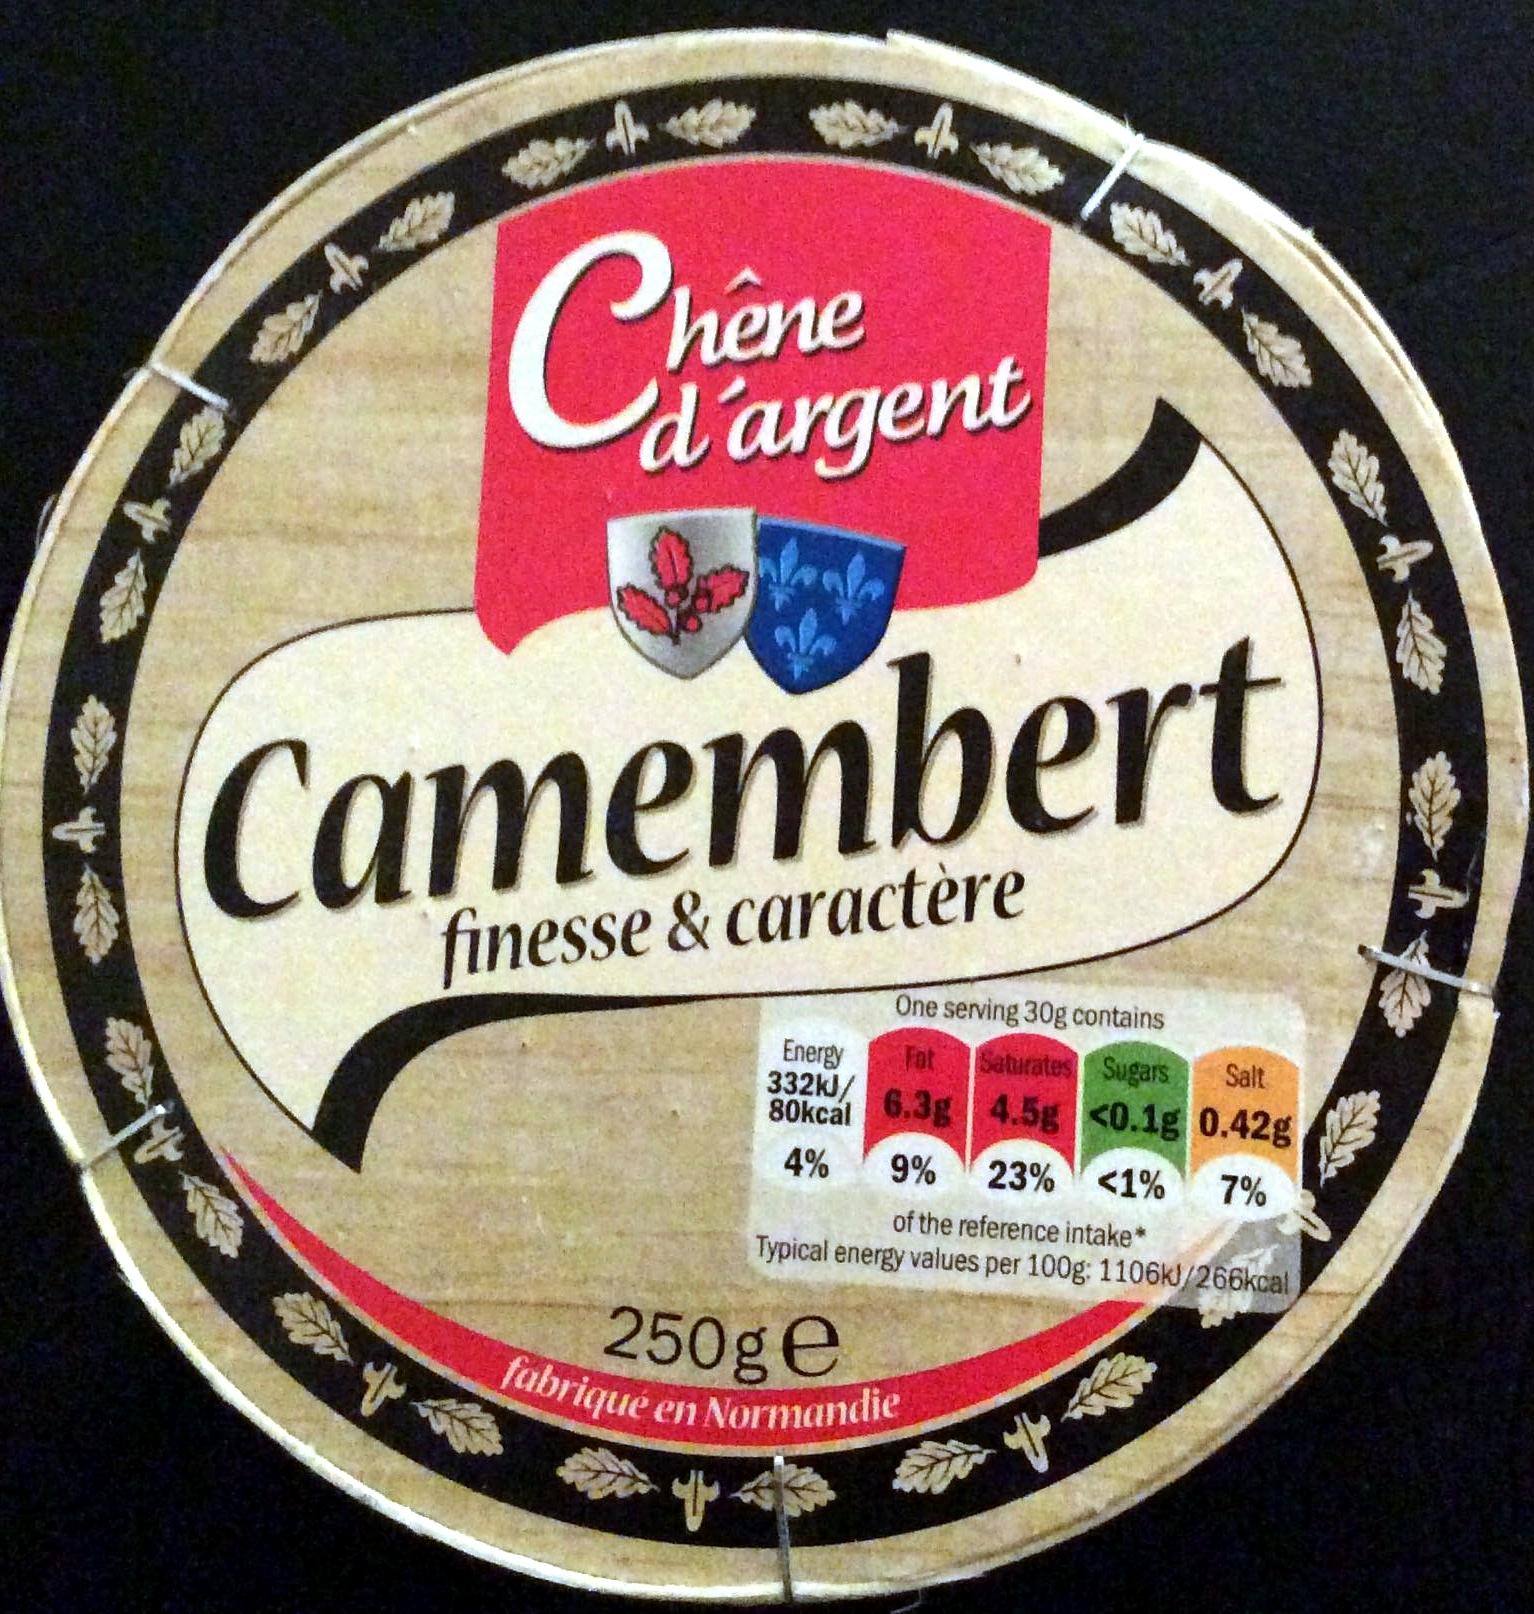 Camembert finesse & caractère - Product - en